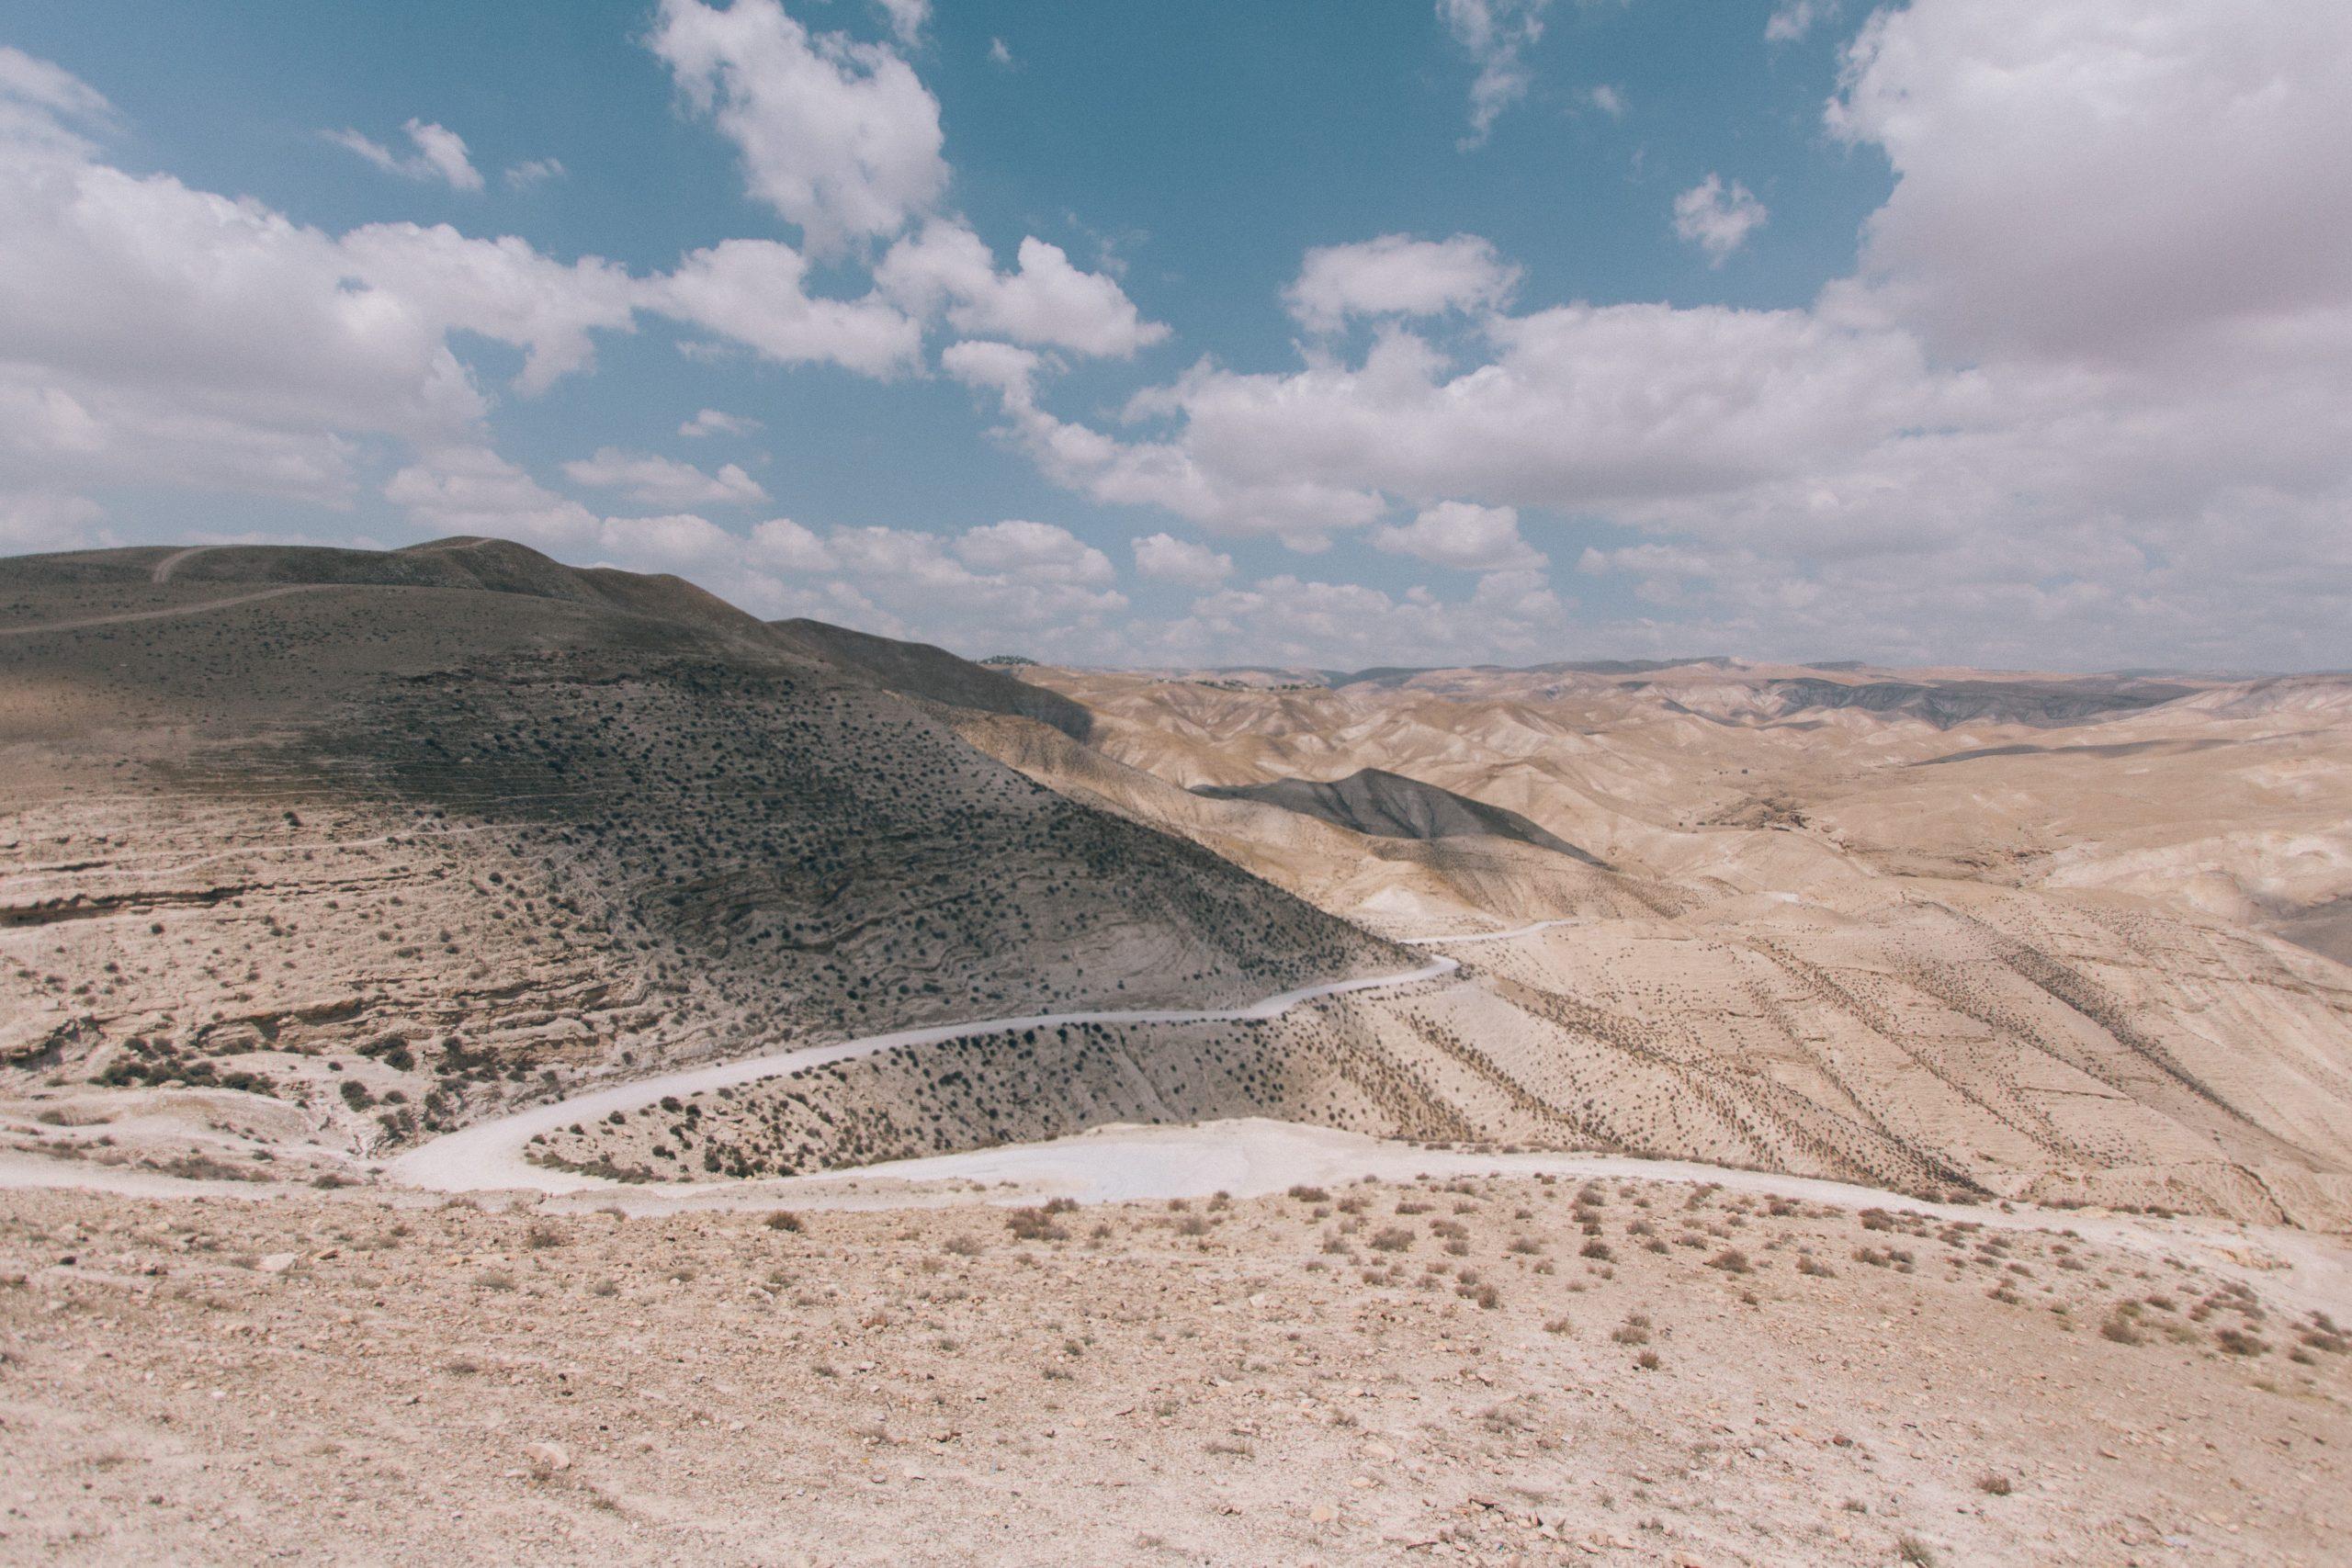 Session 5 – Hezekiah